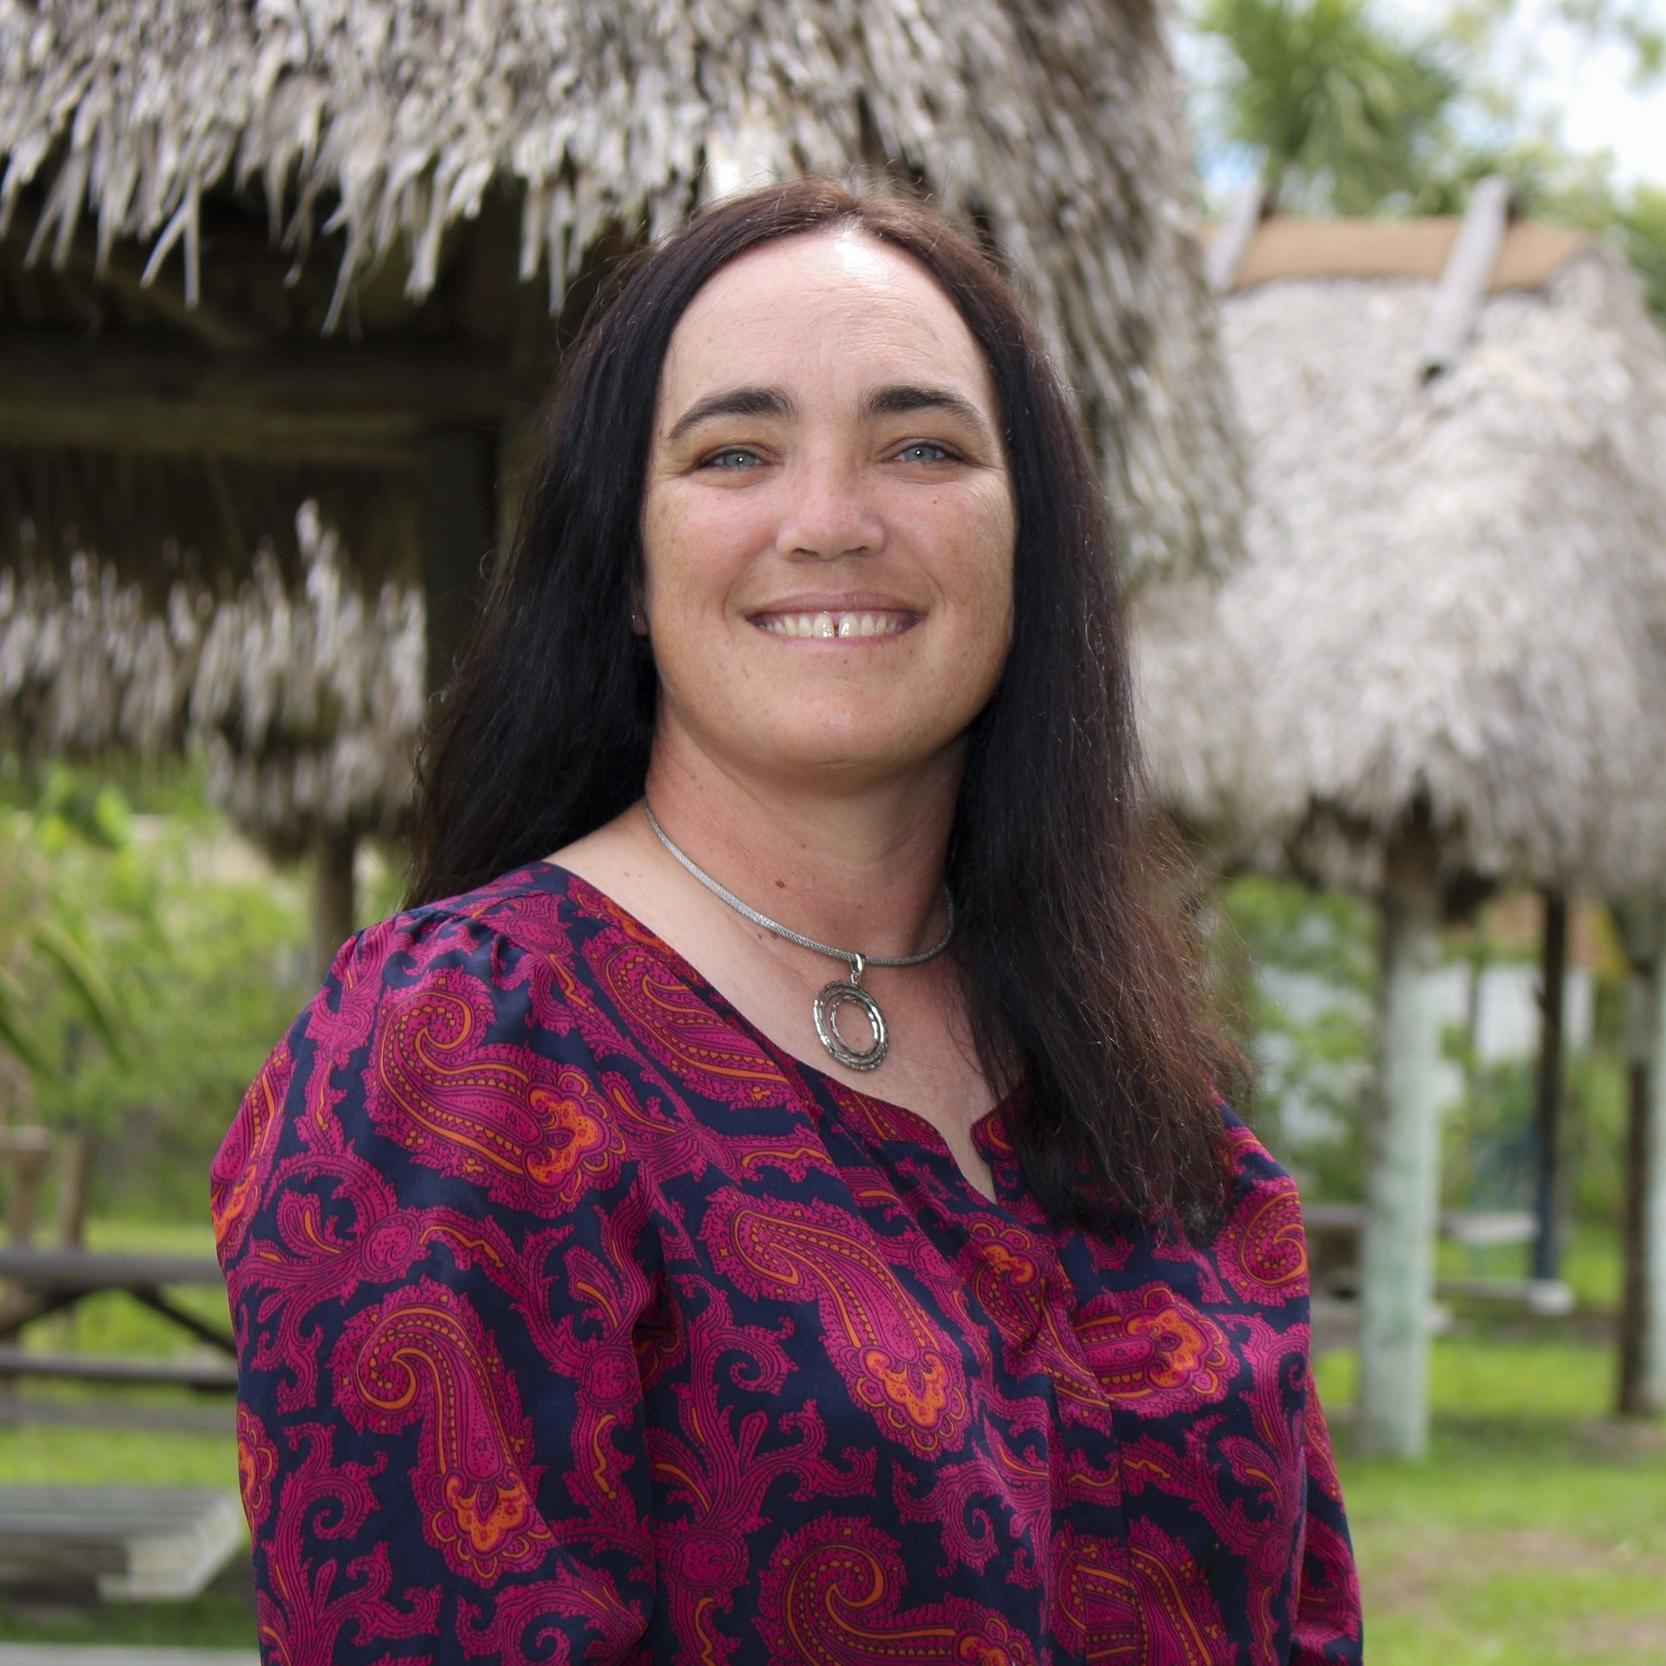 Joy Prescott, 2019 Florida Teacher of the Year